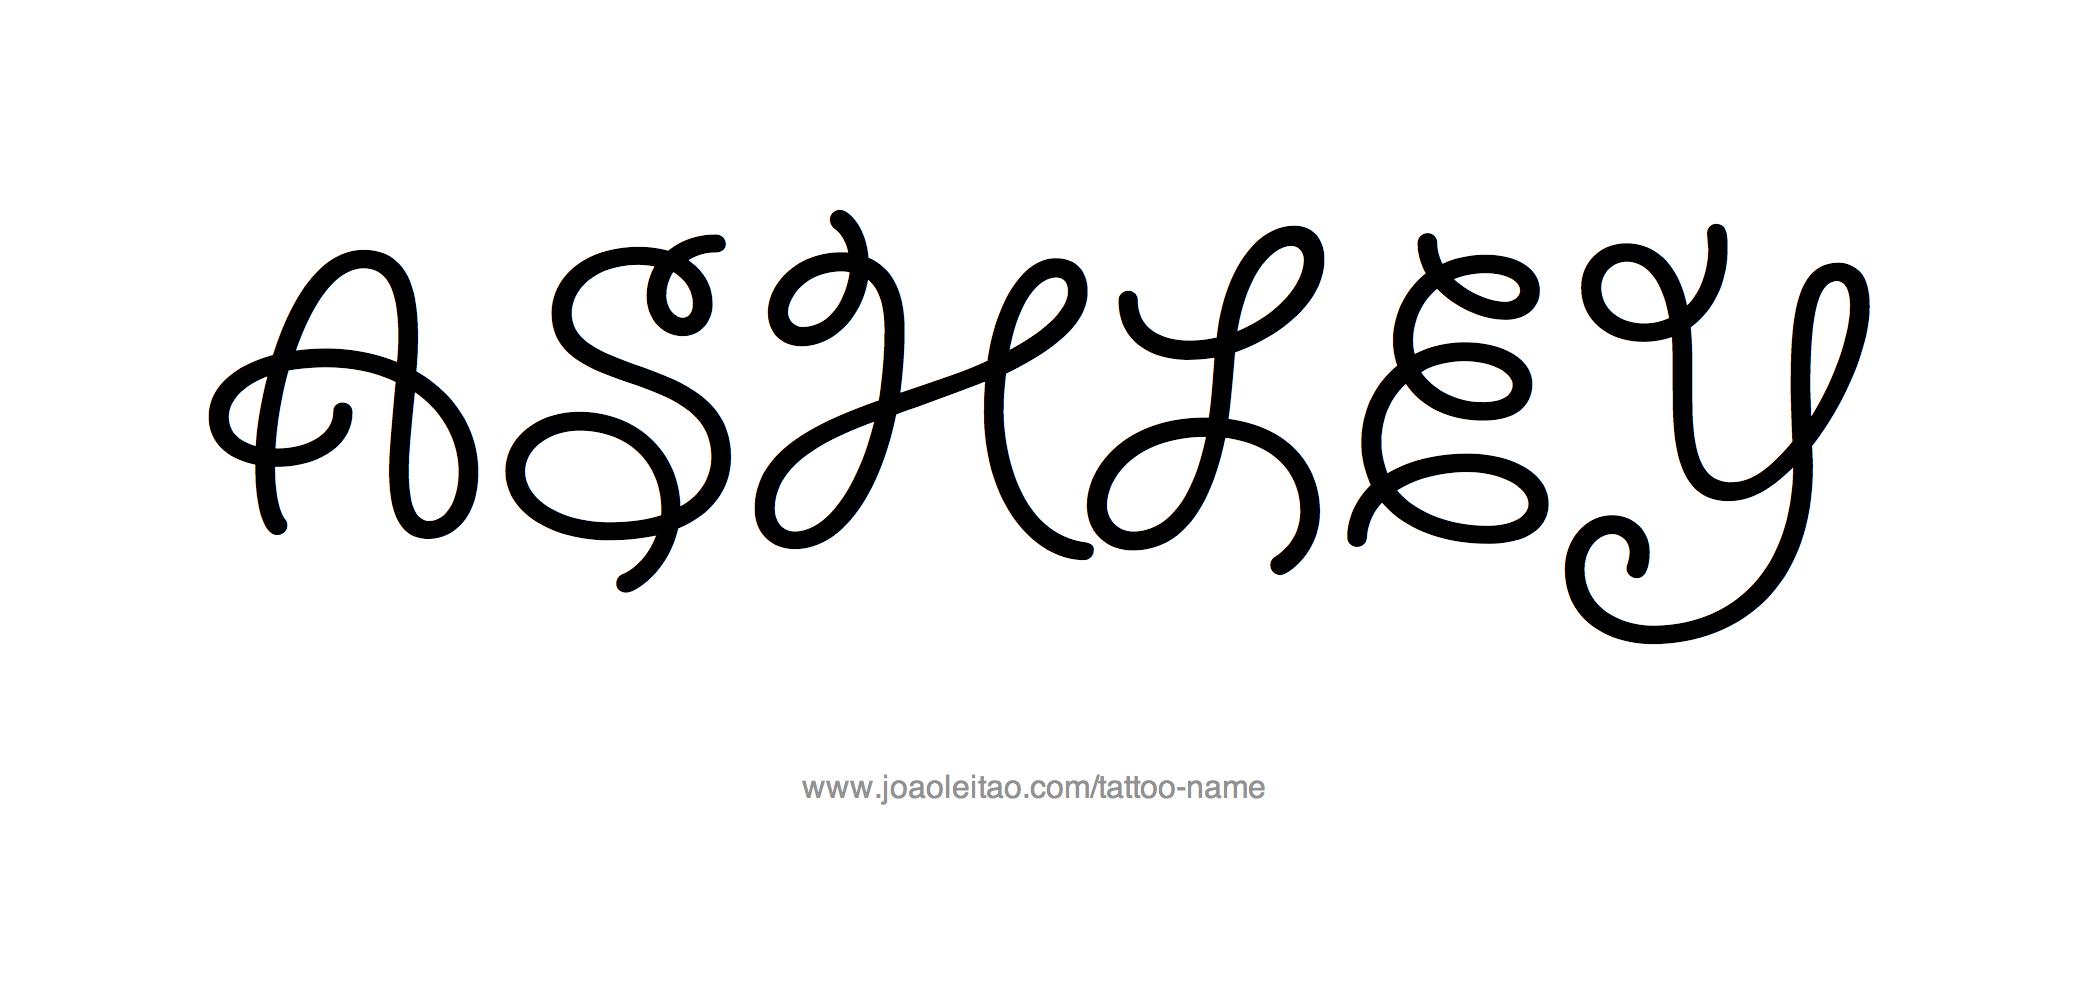 Pin Bubble Writing Creator Ajilbabcom Portal on Pinterest